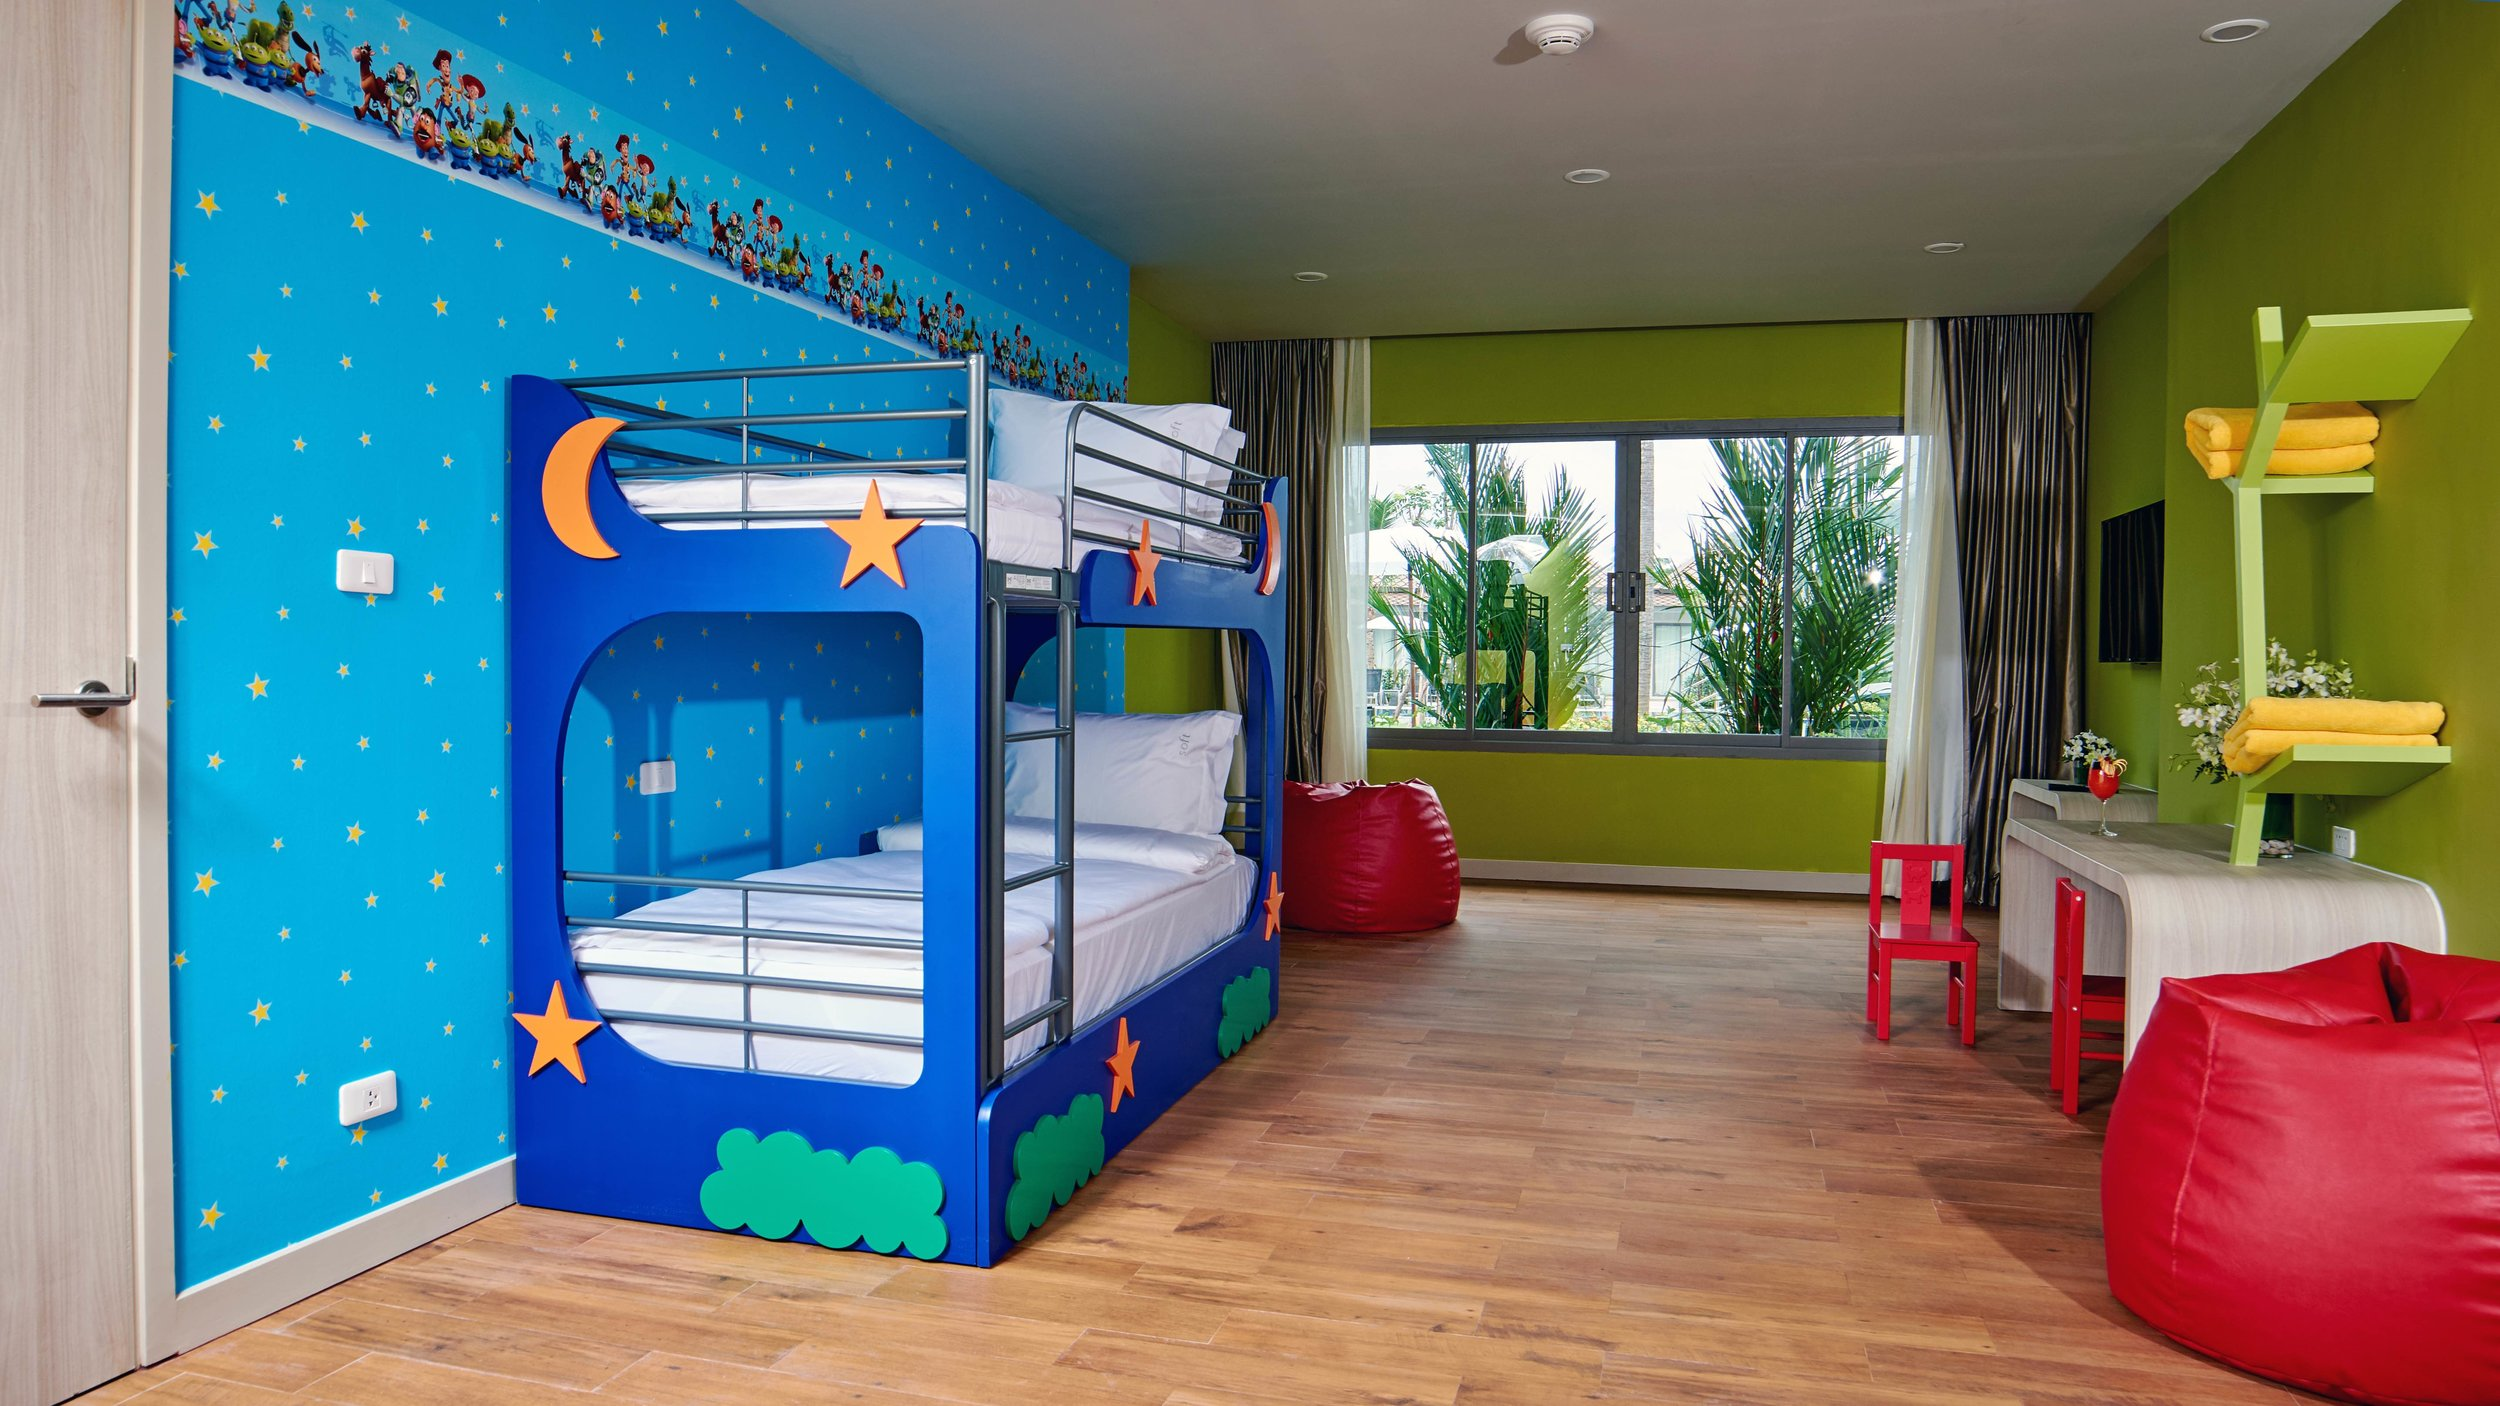 kids-suite_family-wing_008_31186907683_o.jpg